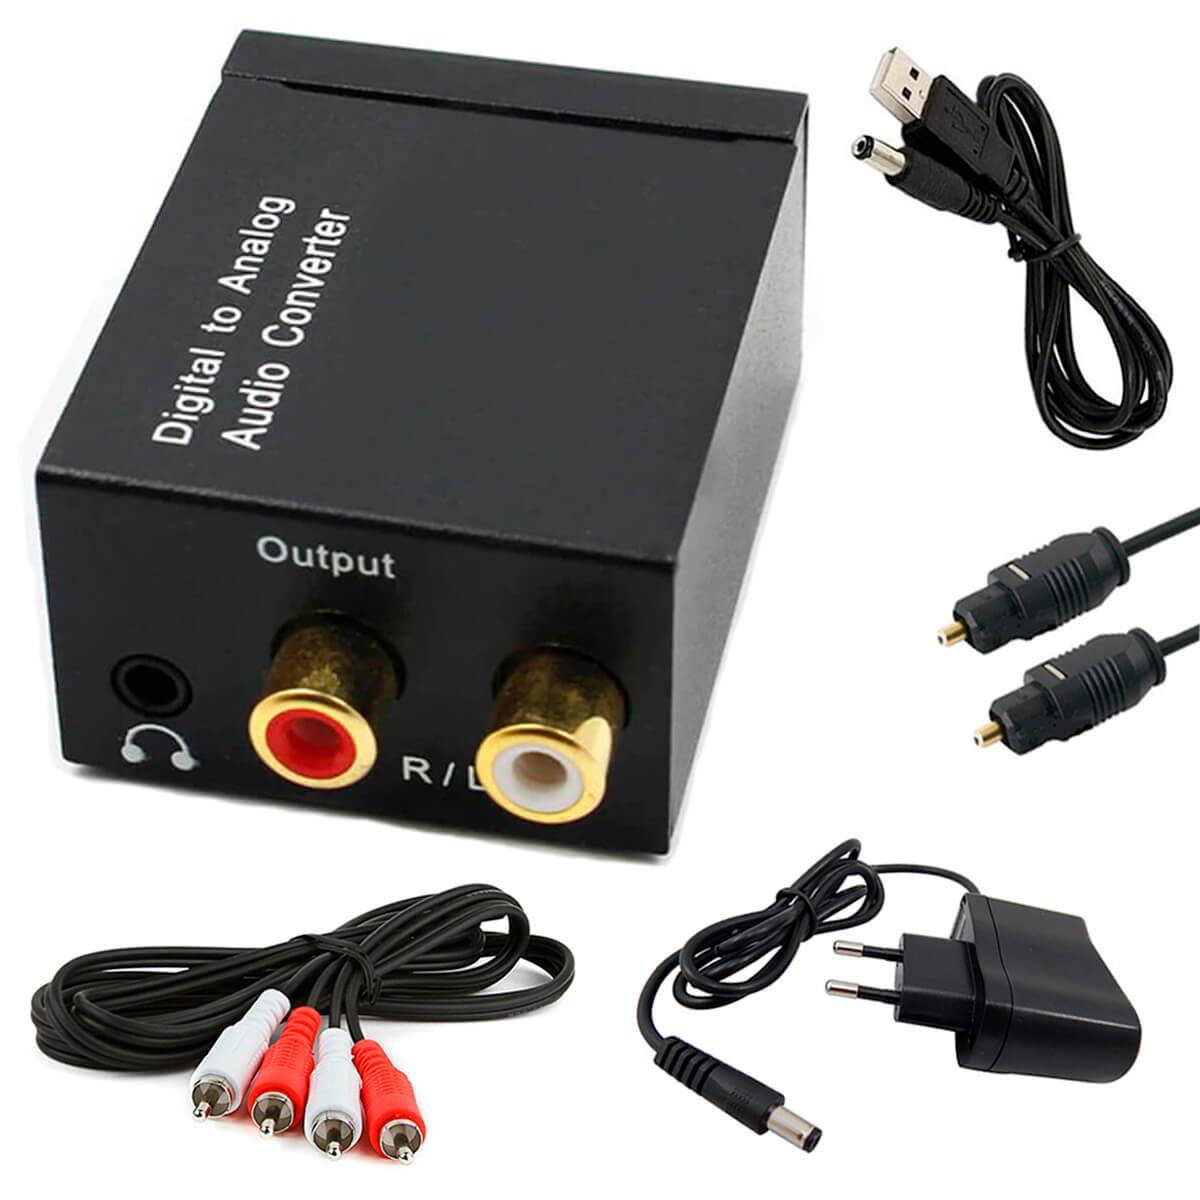 KIT Conversor Áudio Digital para RCA e P2 XT-5529 + Cabo Óptico Toslink 3 mts + Cabo Áudio Rca x Rca + Cabo DC 5V